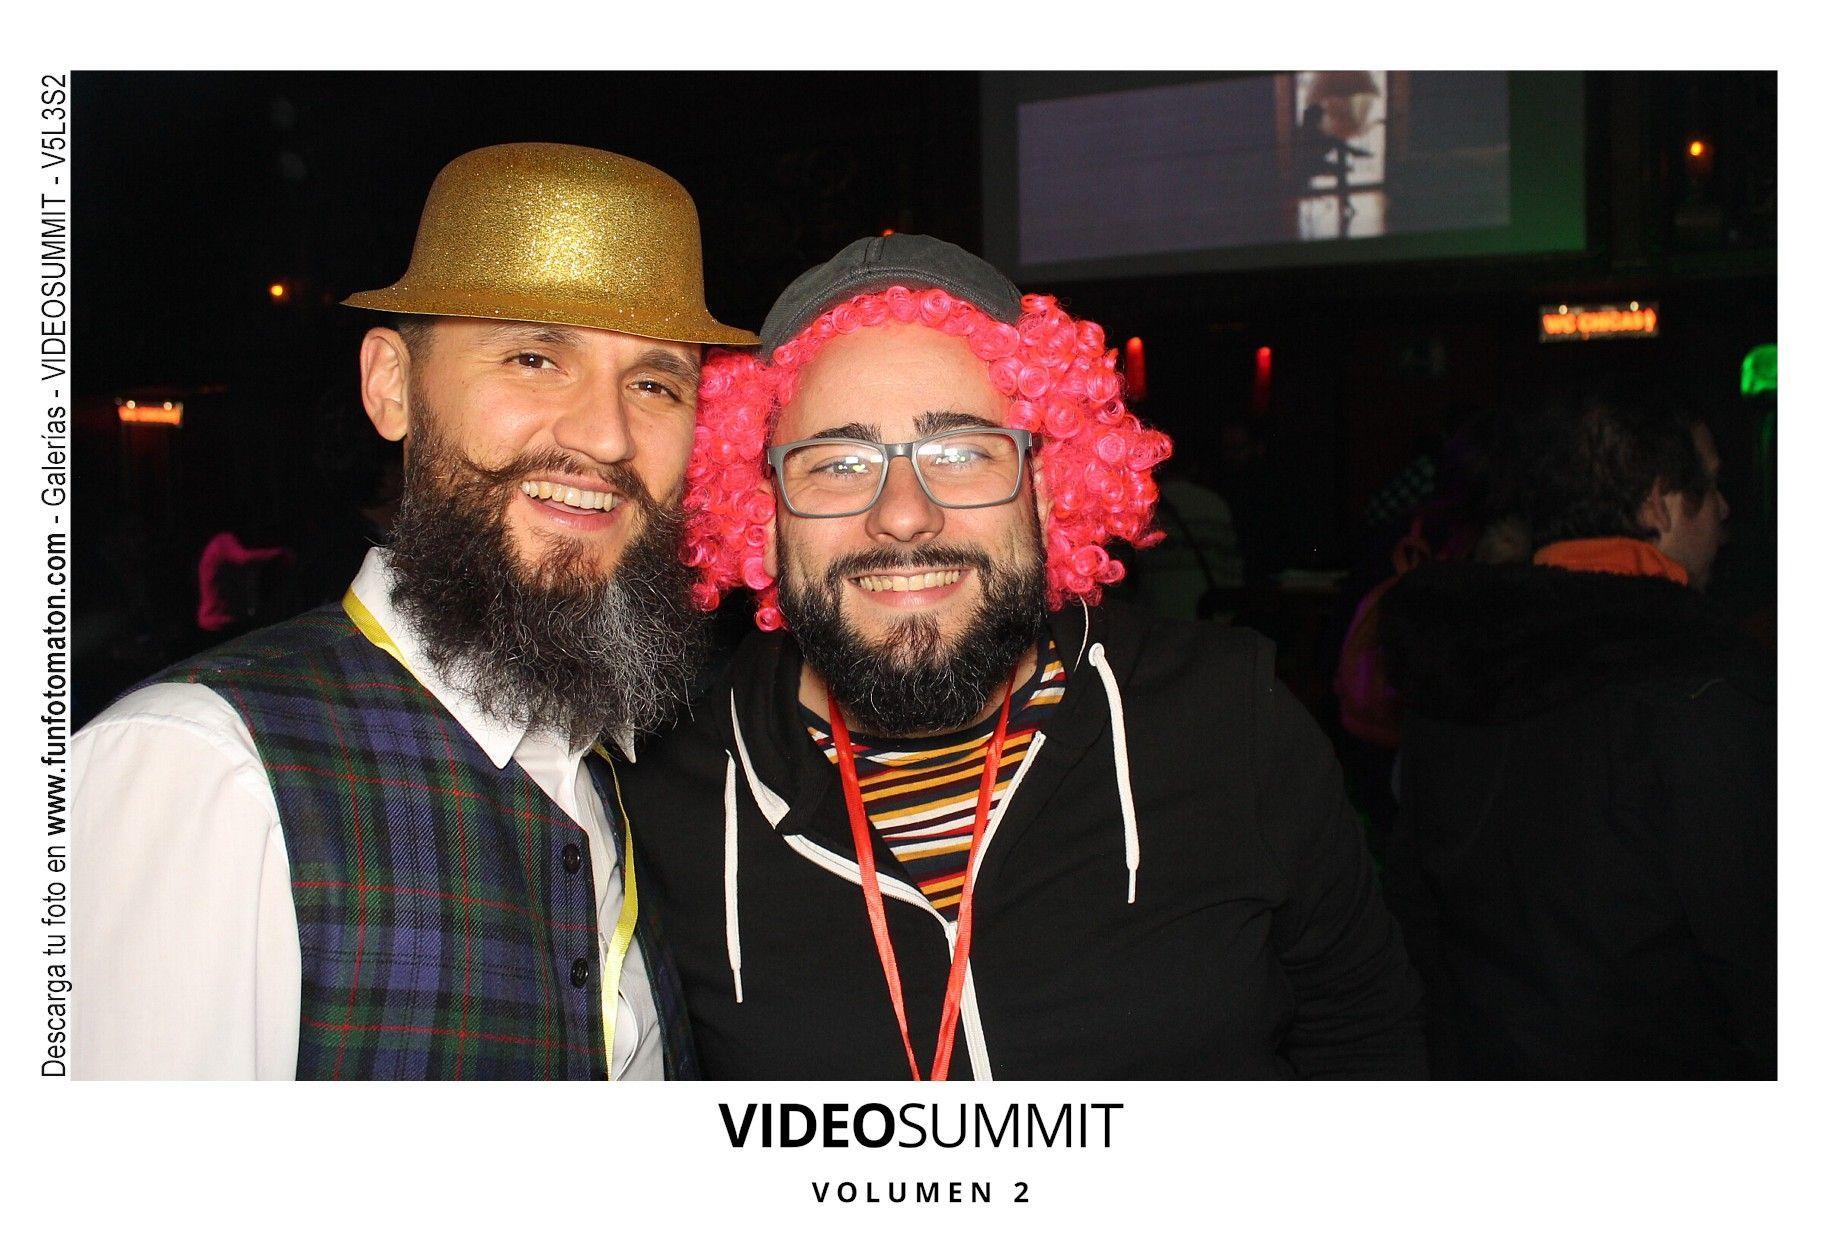 videosummit-vol2-club-party-012